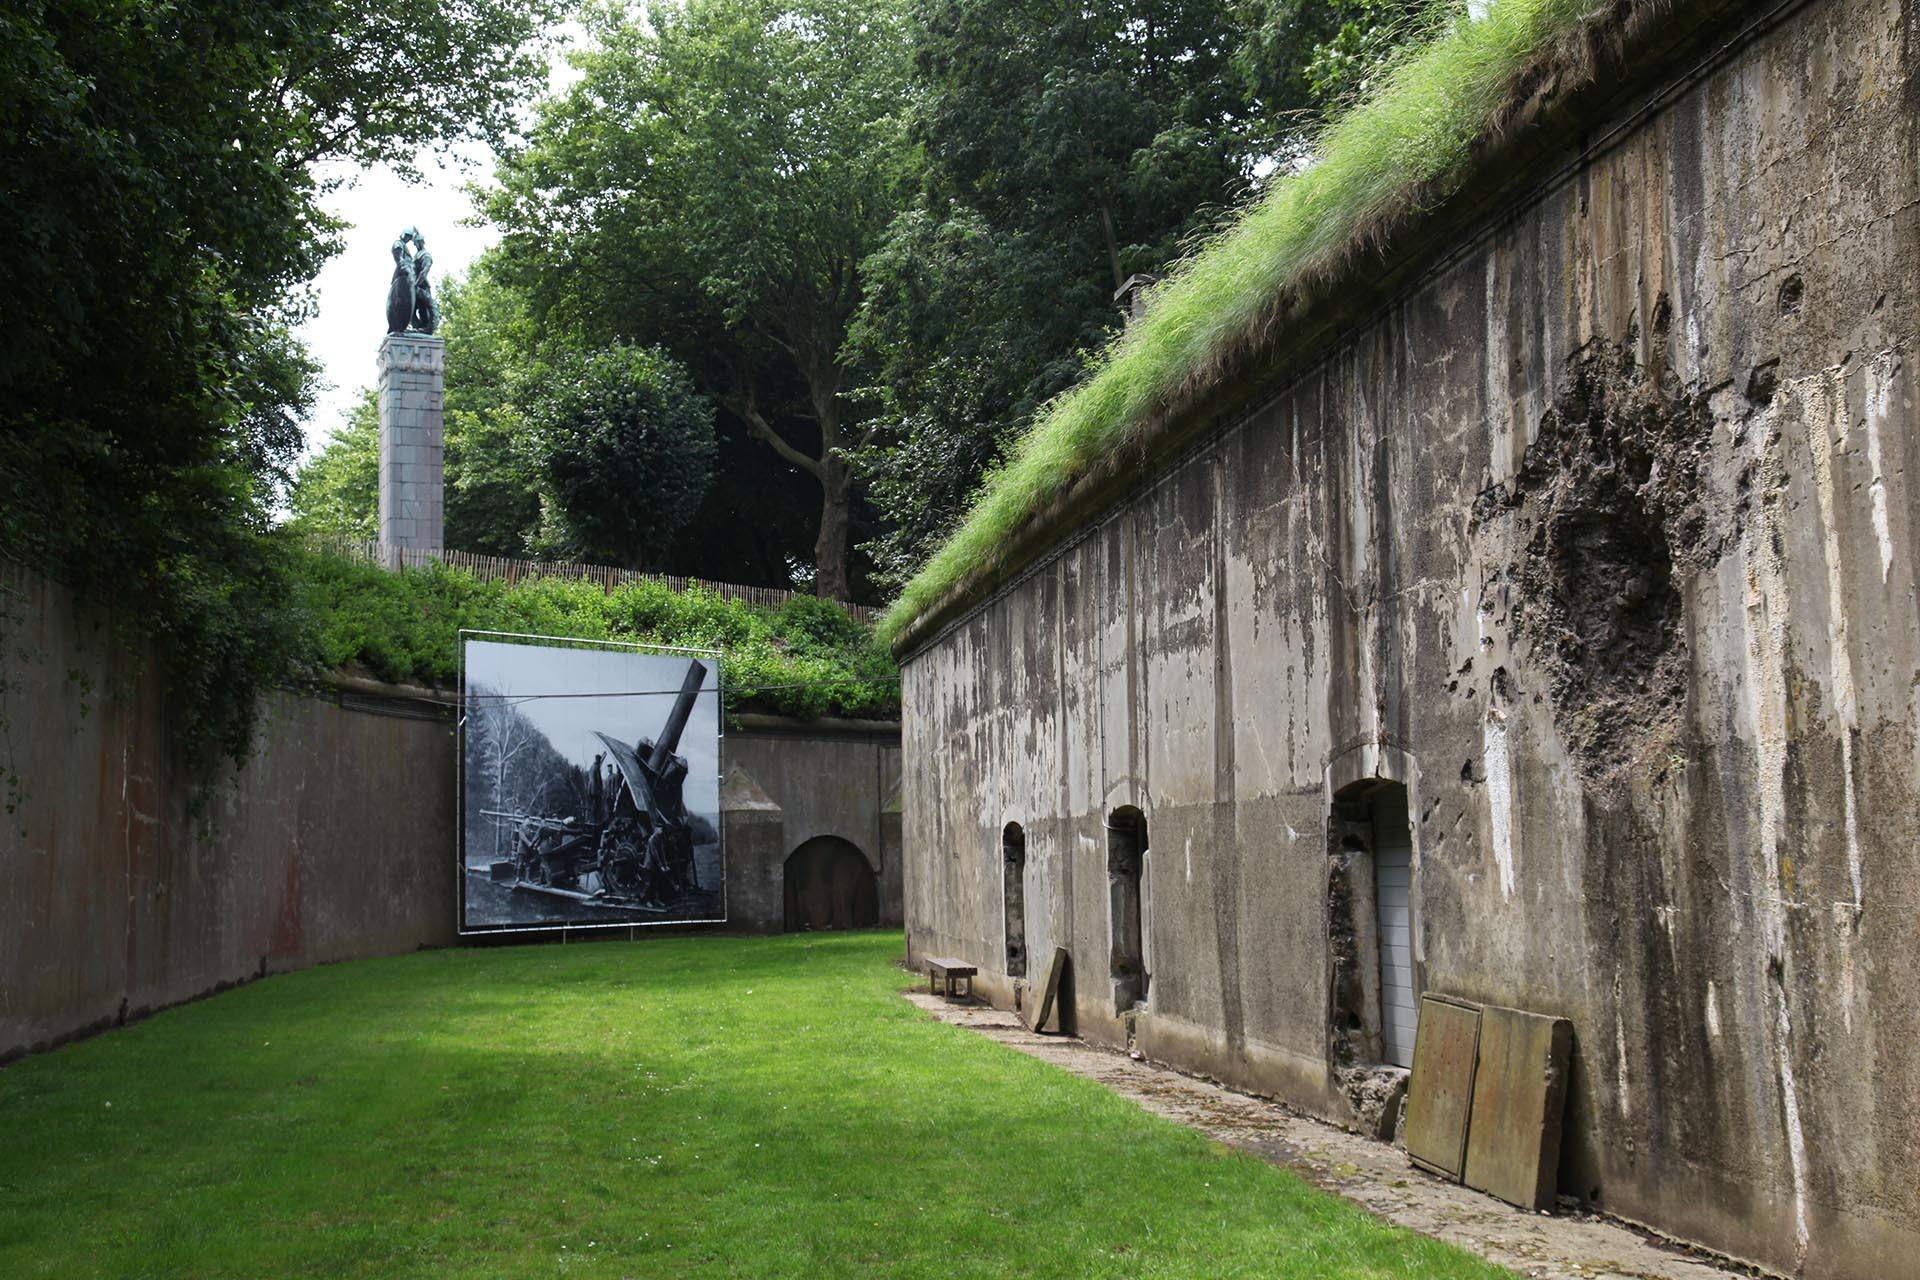 Fort Loncin